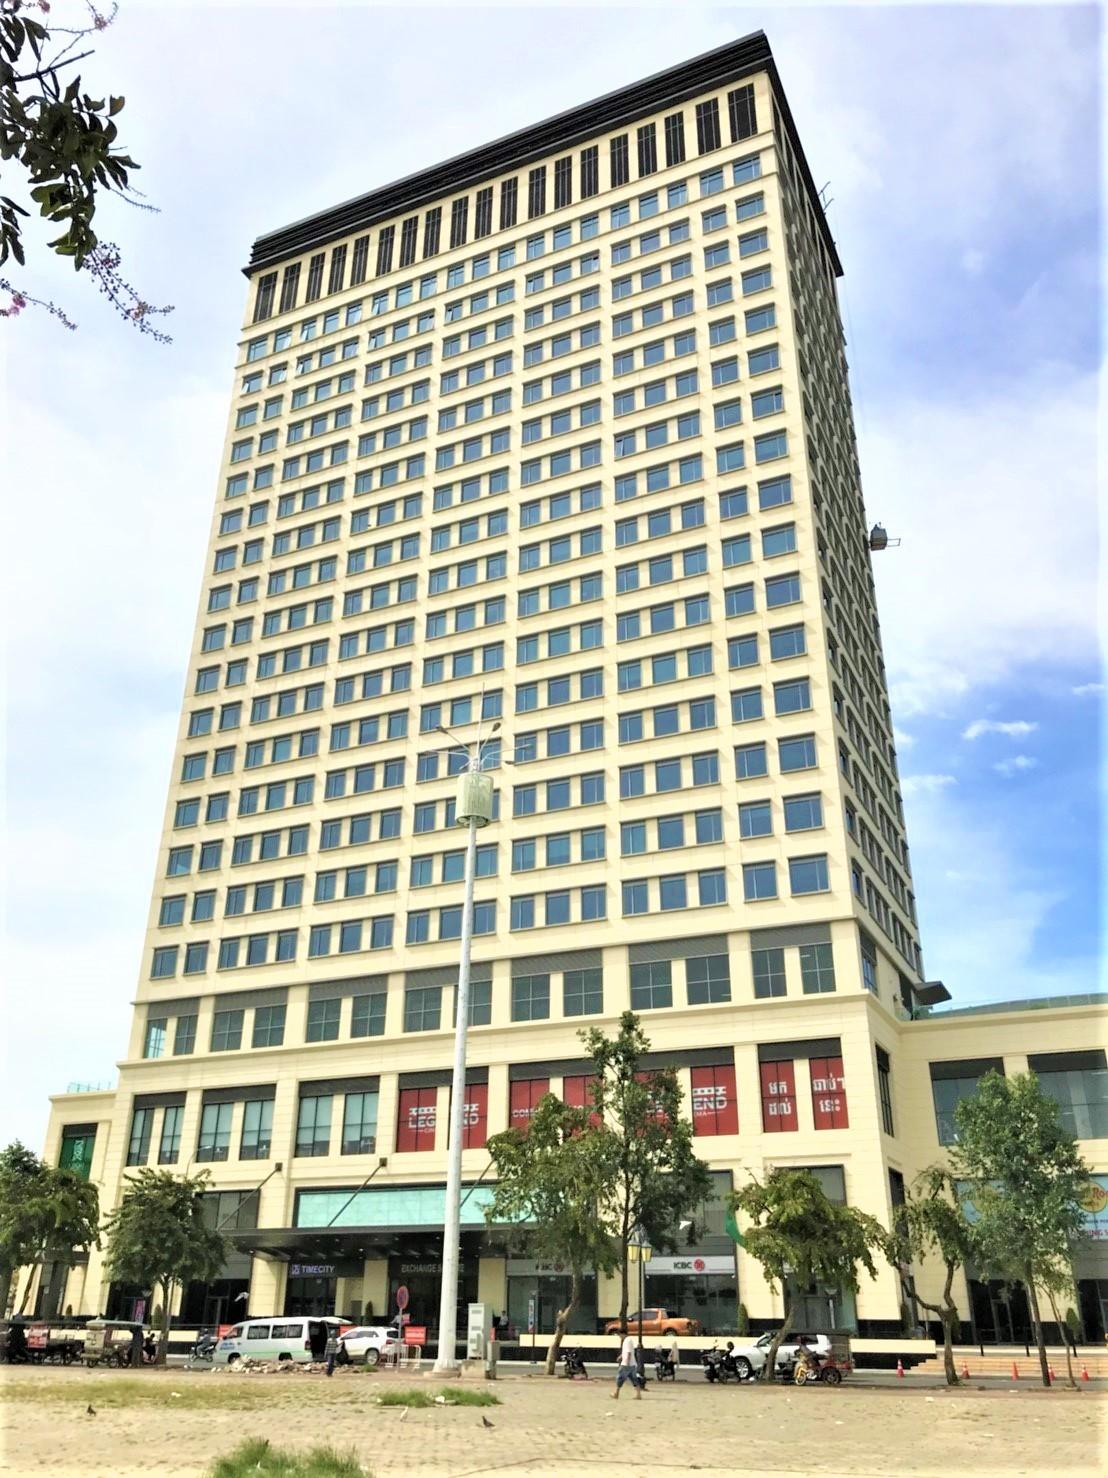 Exchang Square Phnom Penh กับโรงหนังสุดอลังการที่ใช้ผนังกันเสียง Trandar Zoundboard ทั้งหมด